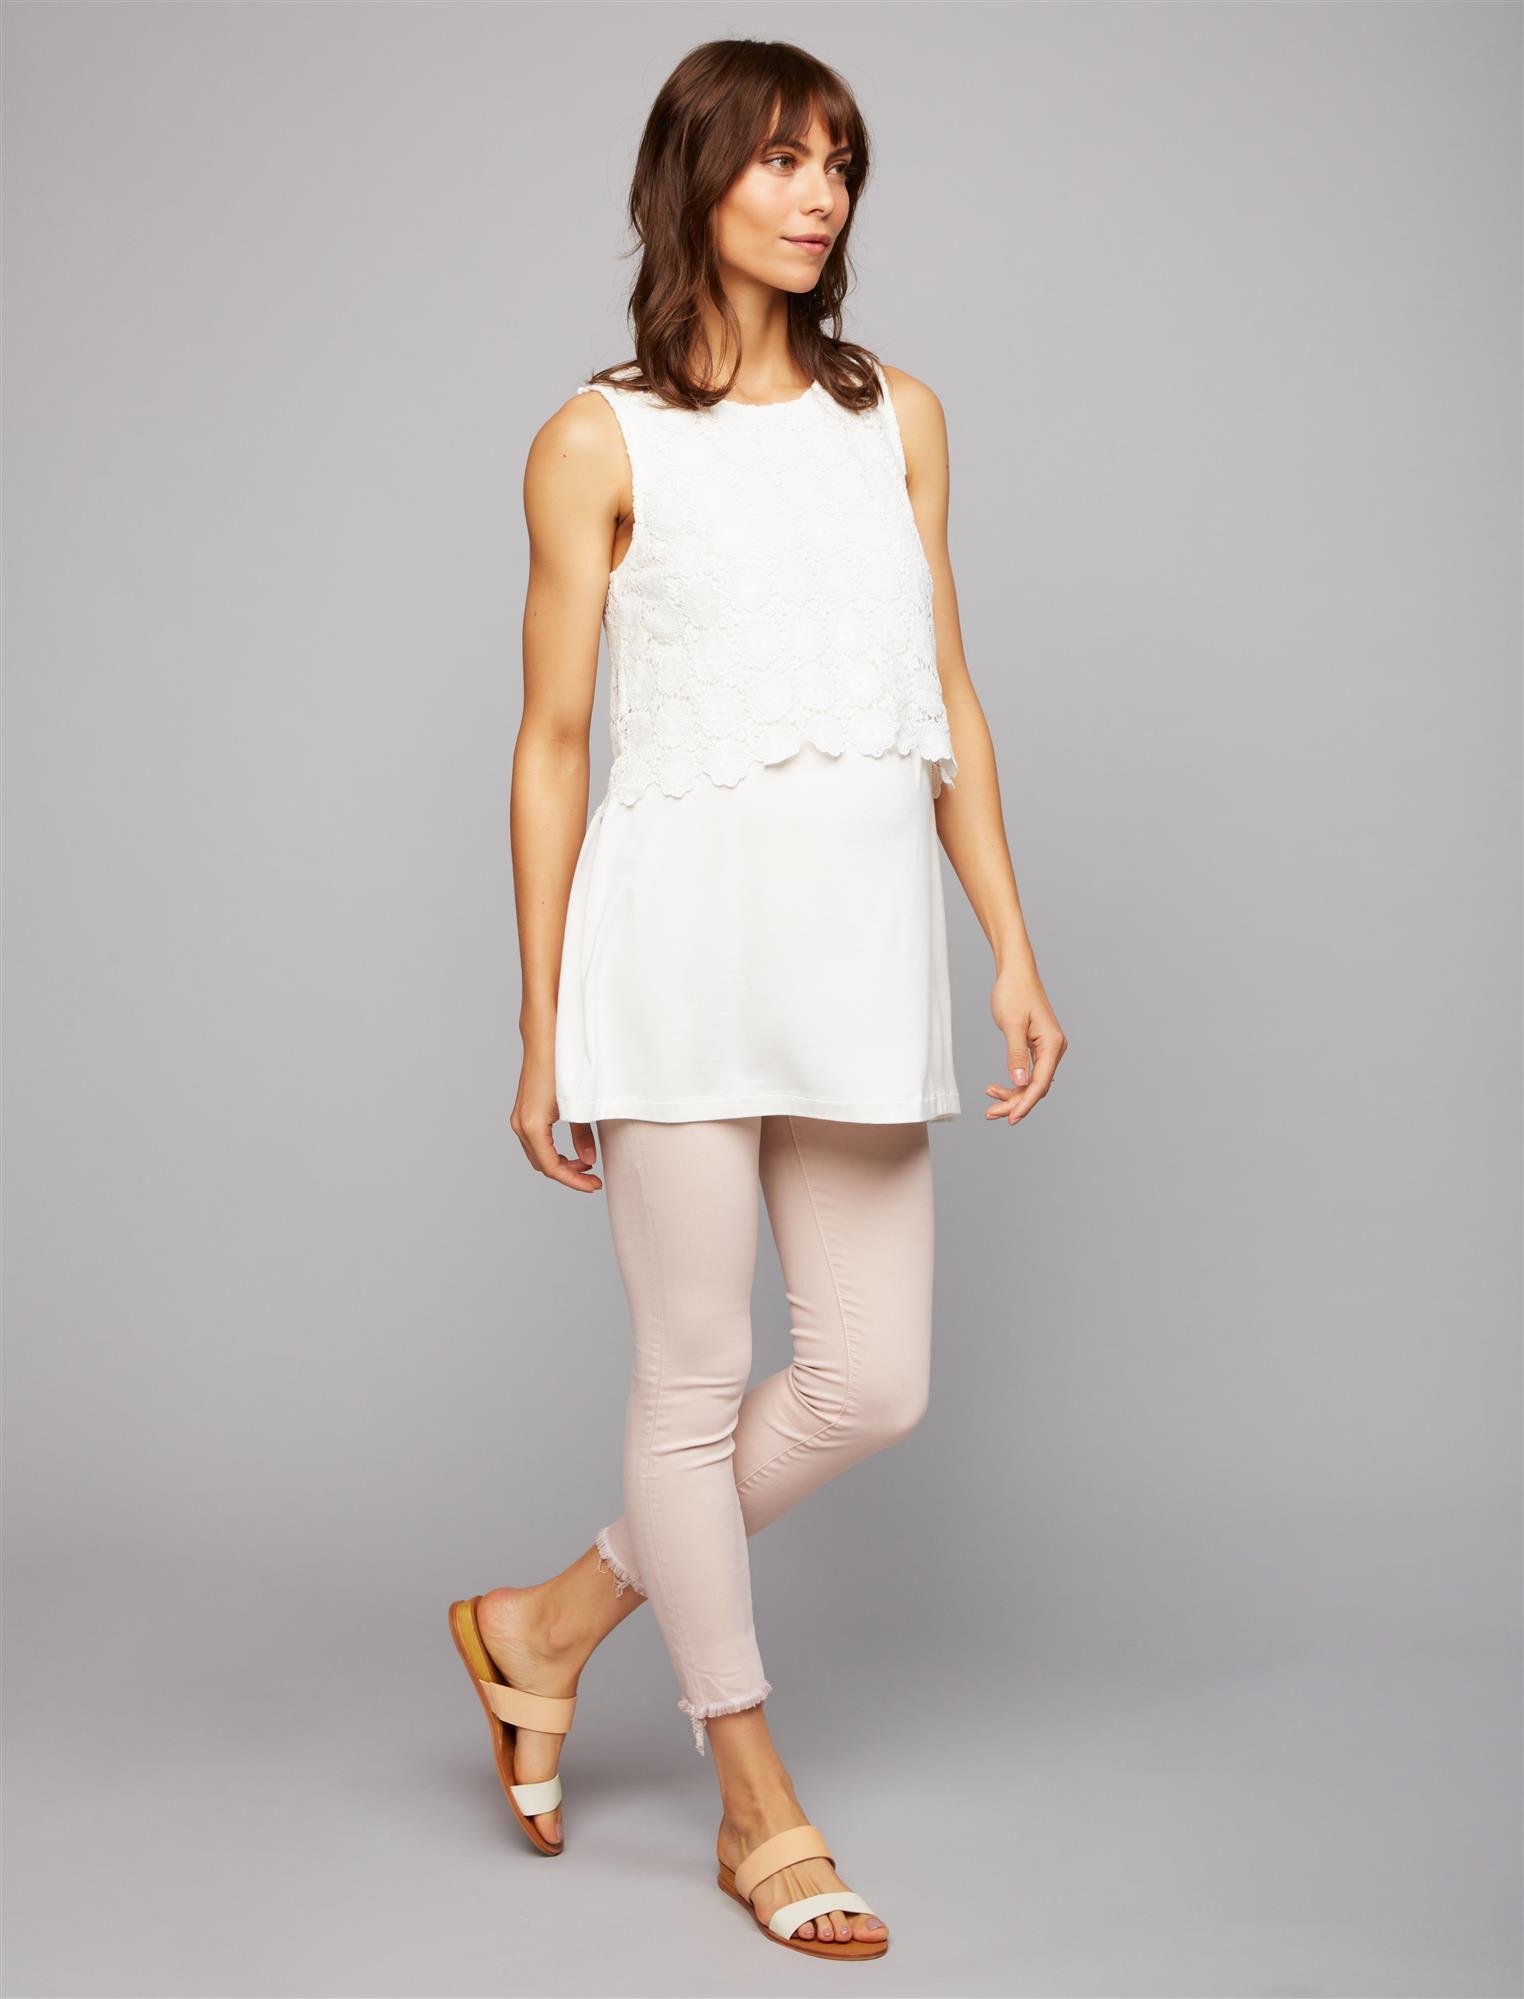 Articles Of Society Secret Fit Belly Fray Hem Maternity Jeans- Pink